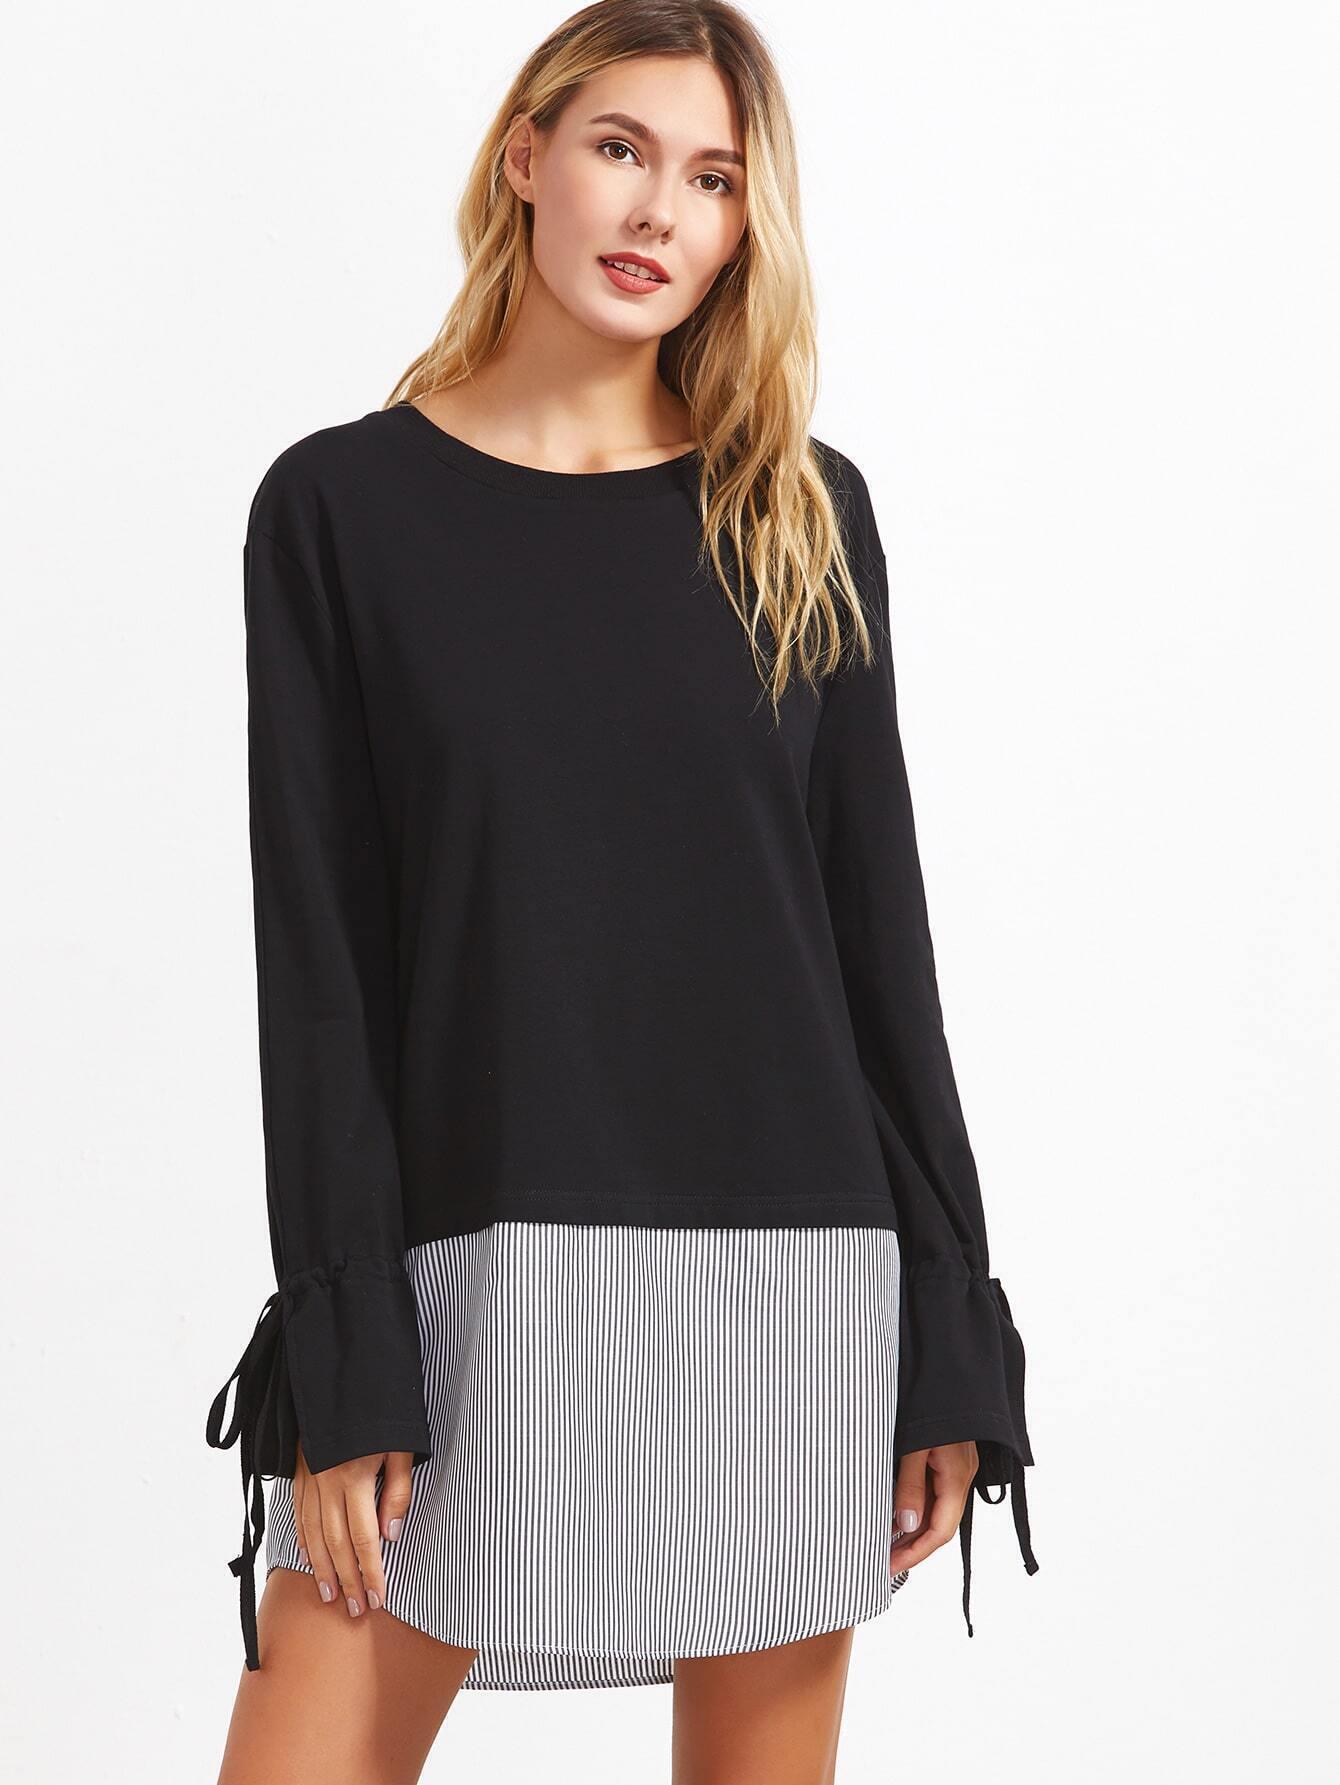 Black Contrast Striped Trim Drawstring Cuff Dress